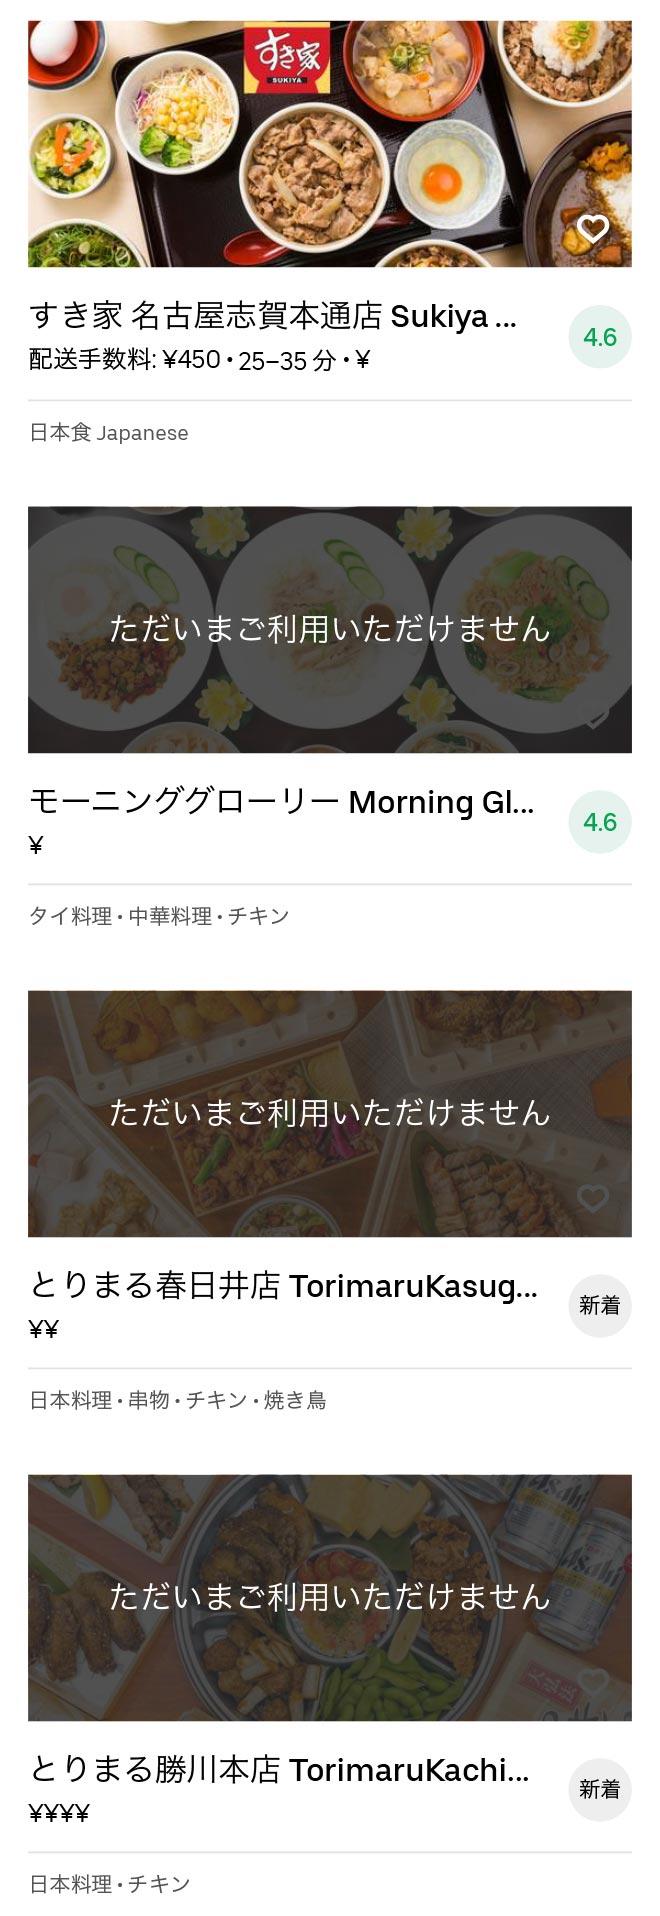 Kachigawa menu 2008 04